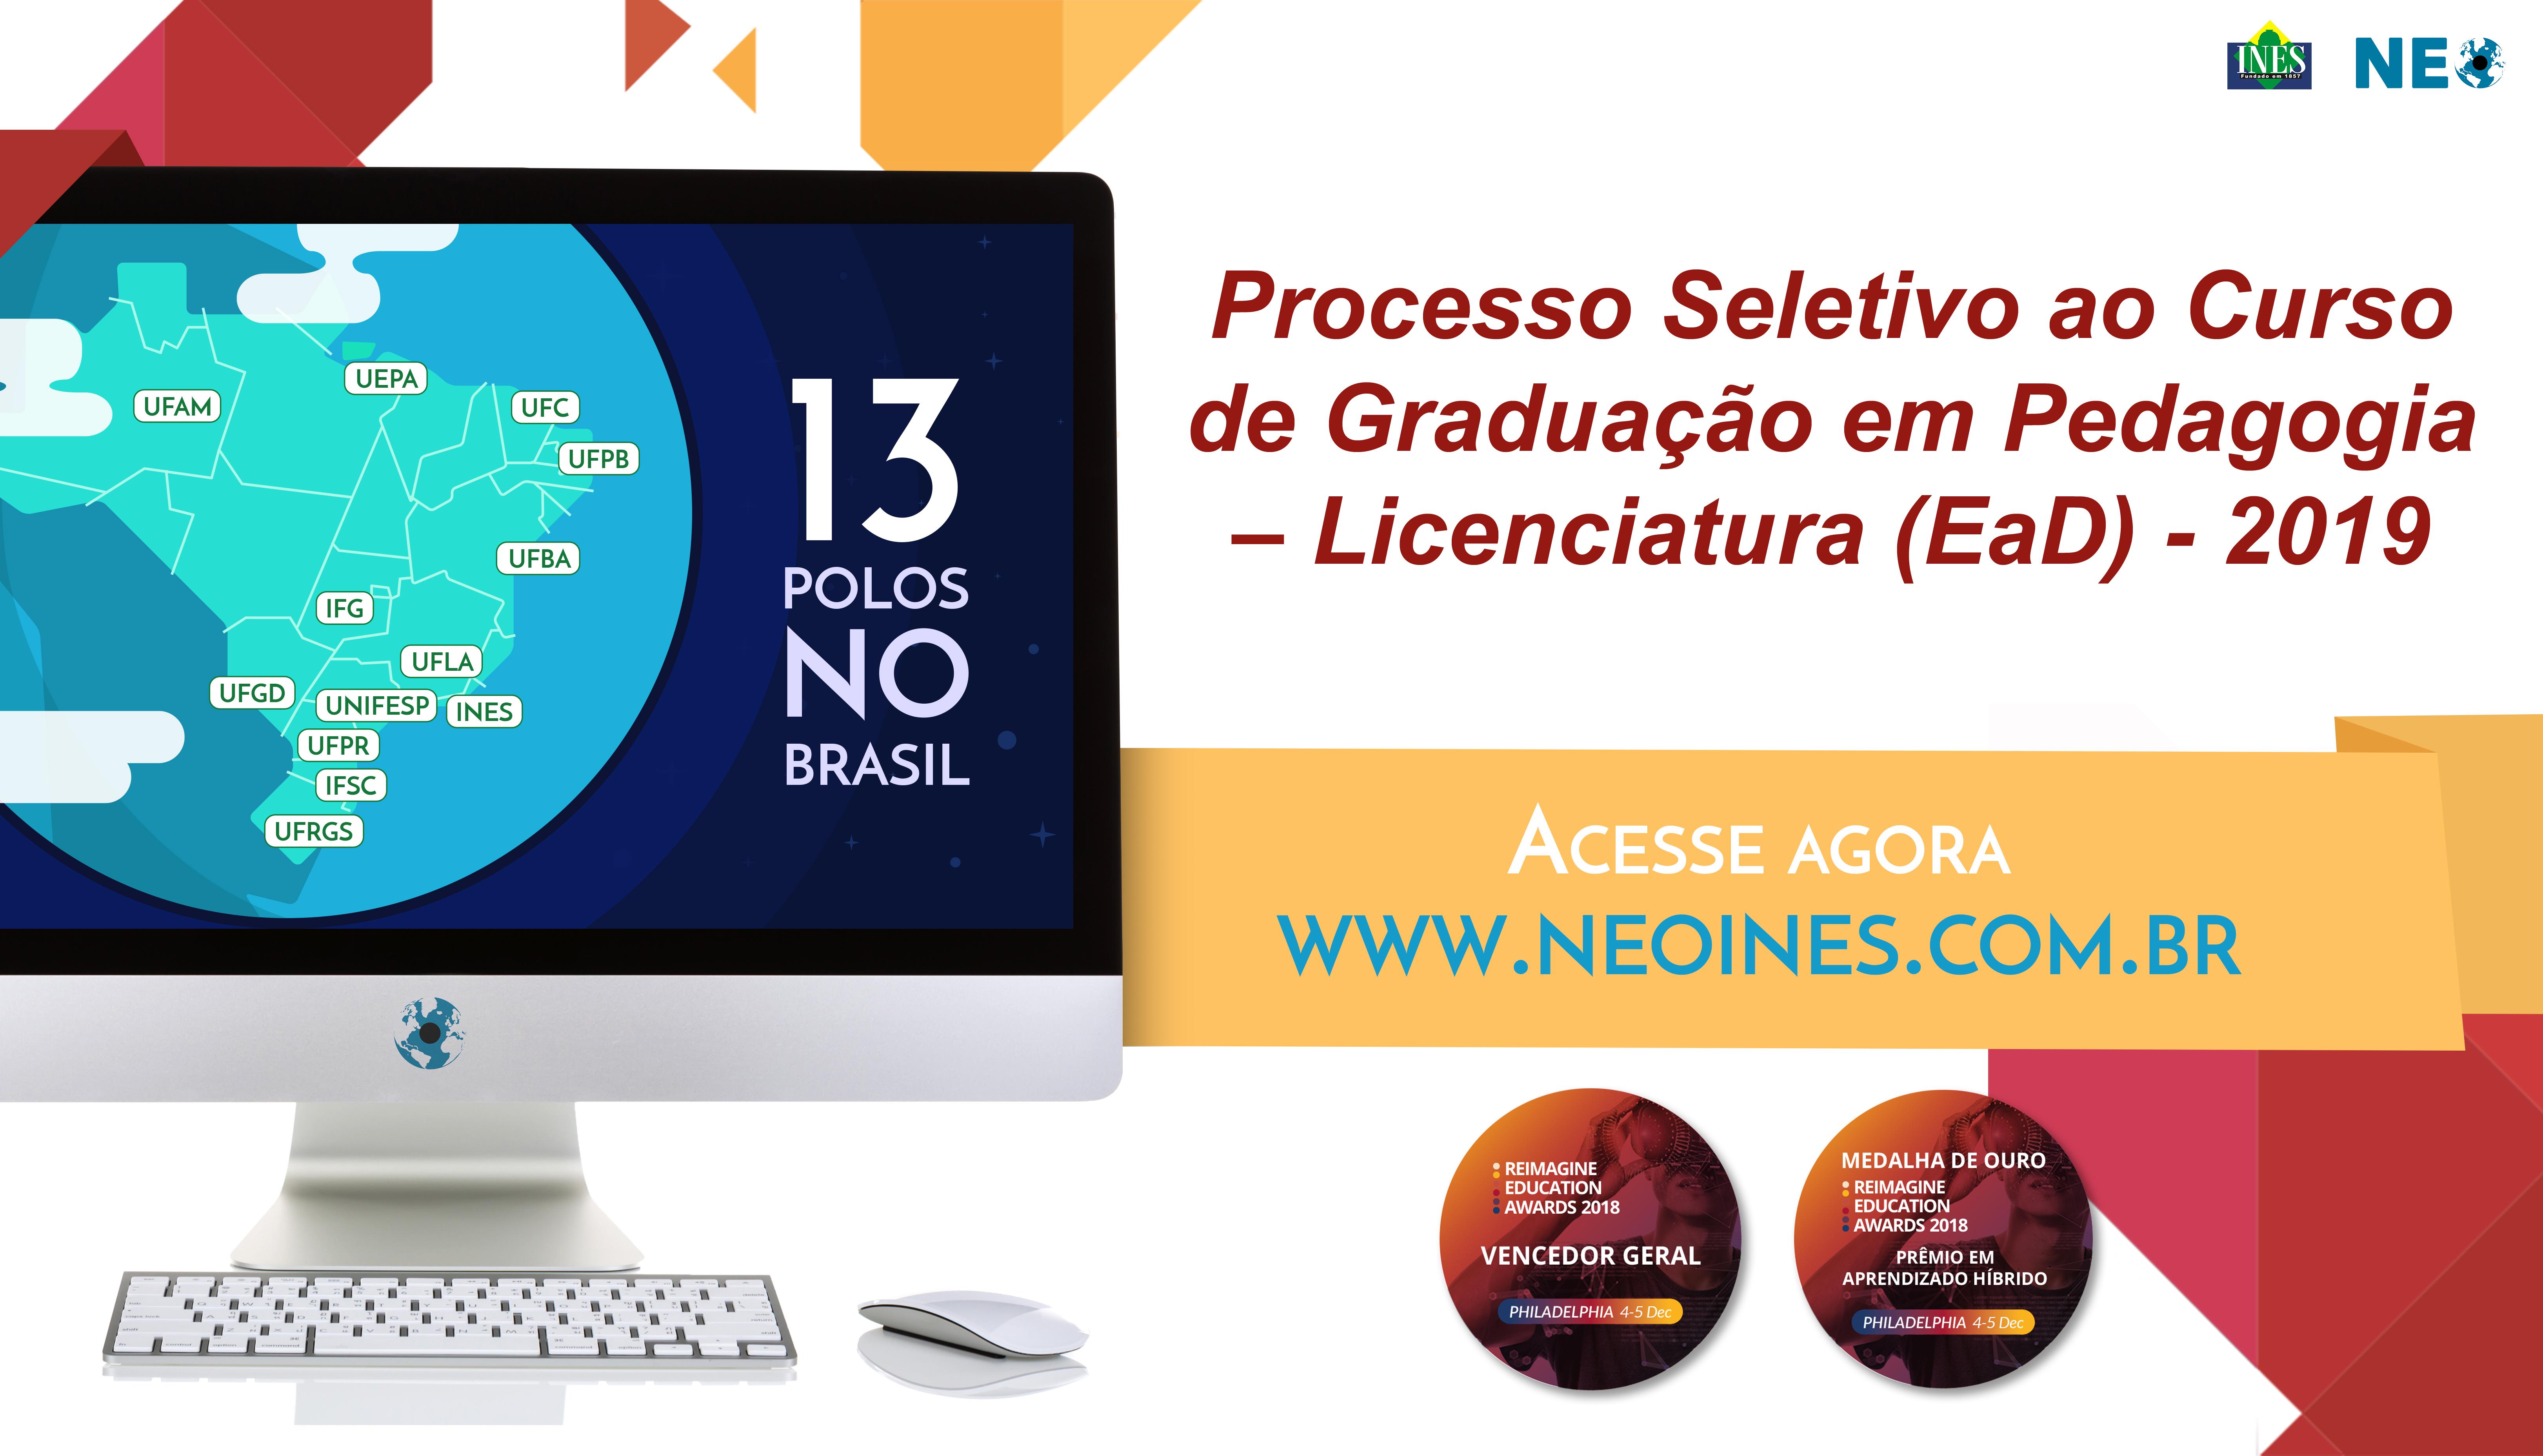 NEO - Processo Seletivo Curso Pedagogia EaD